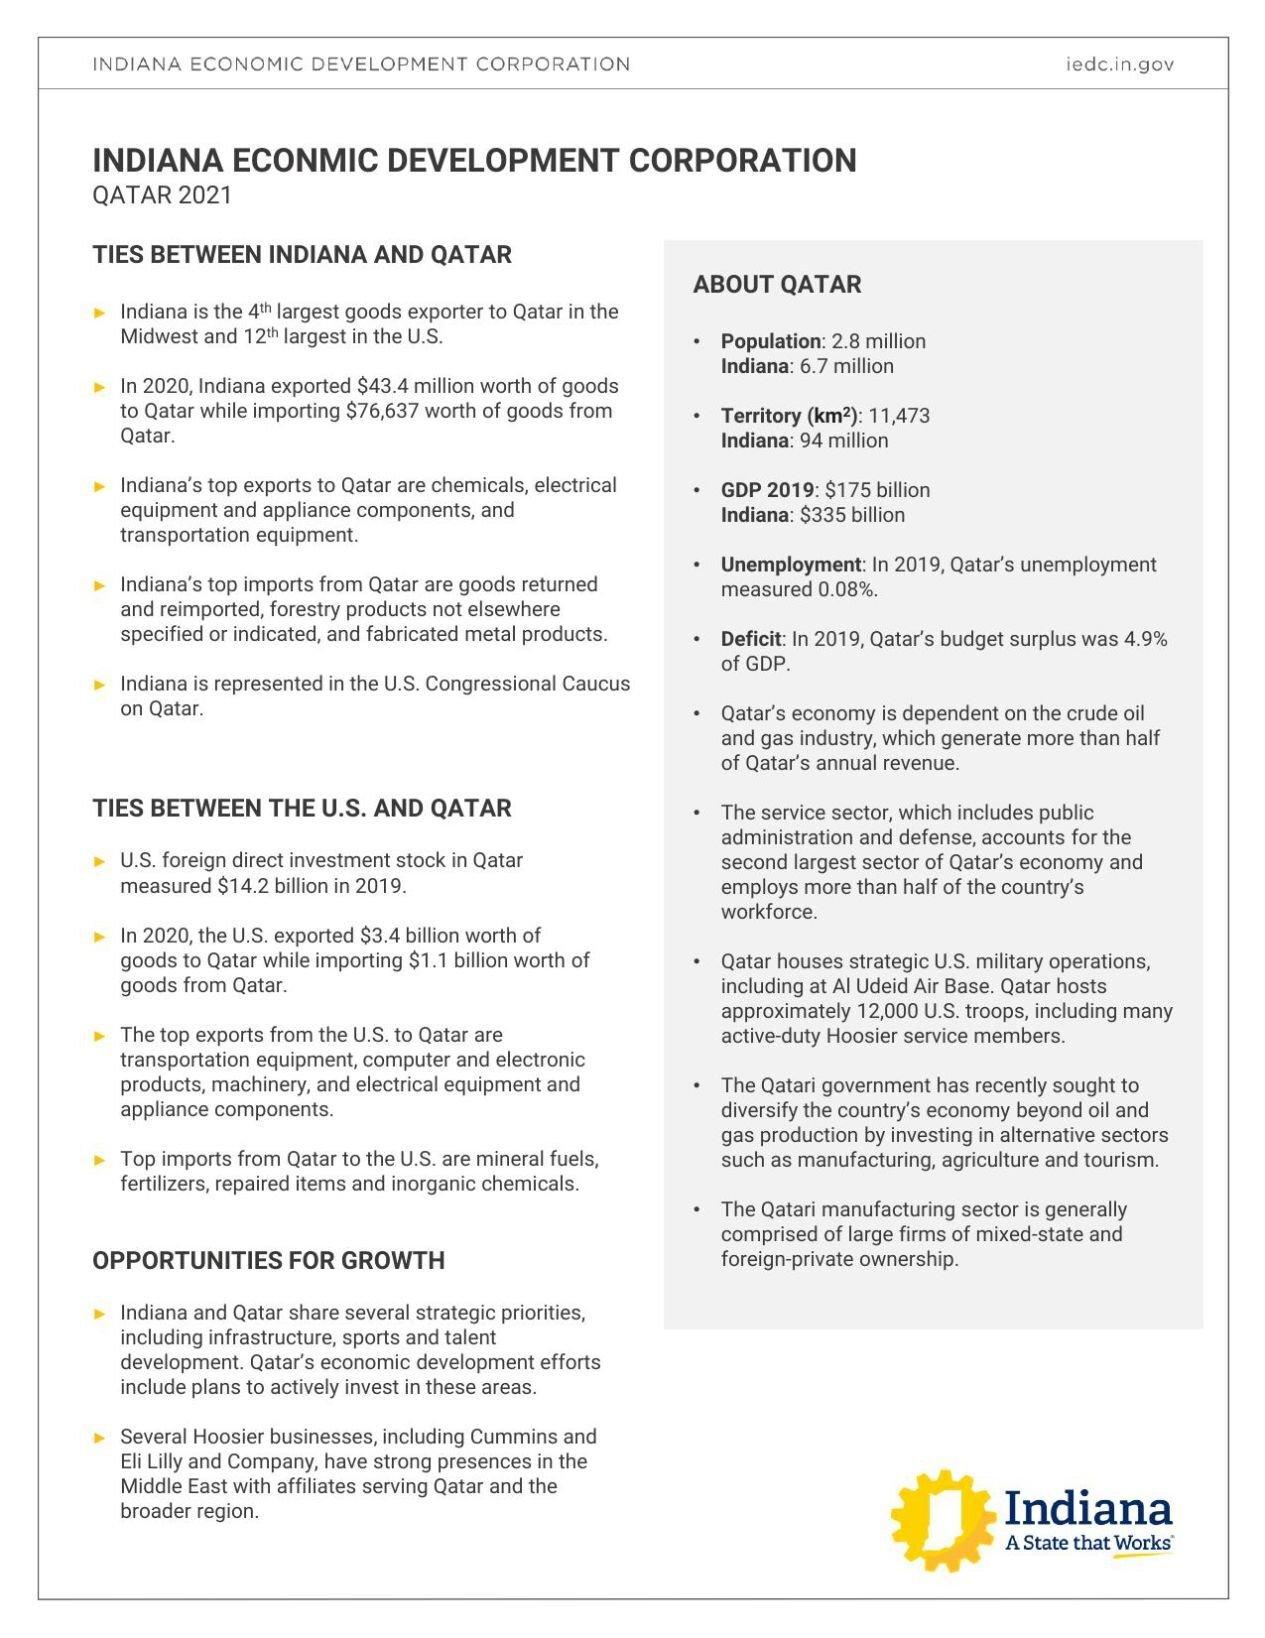 Indiana-Qatar fact sheet